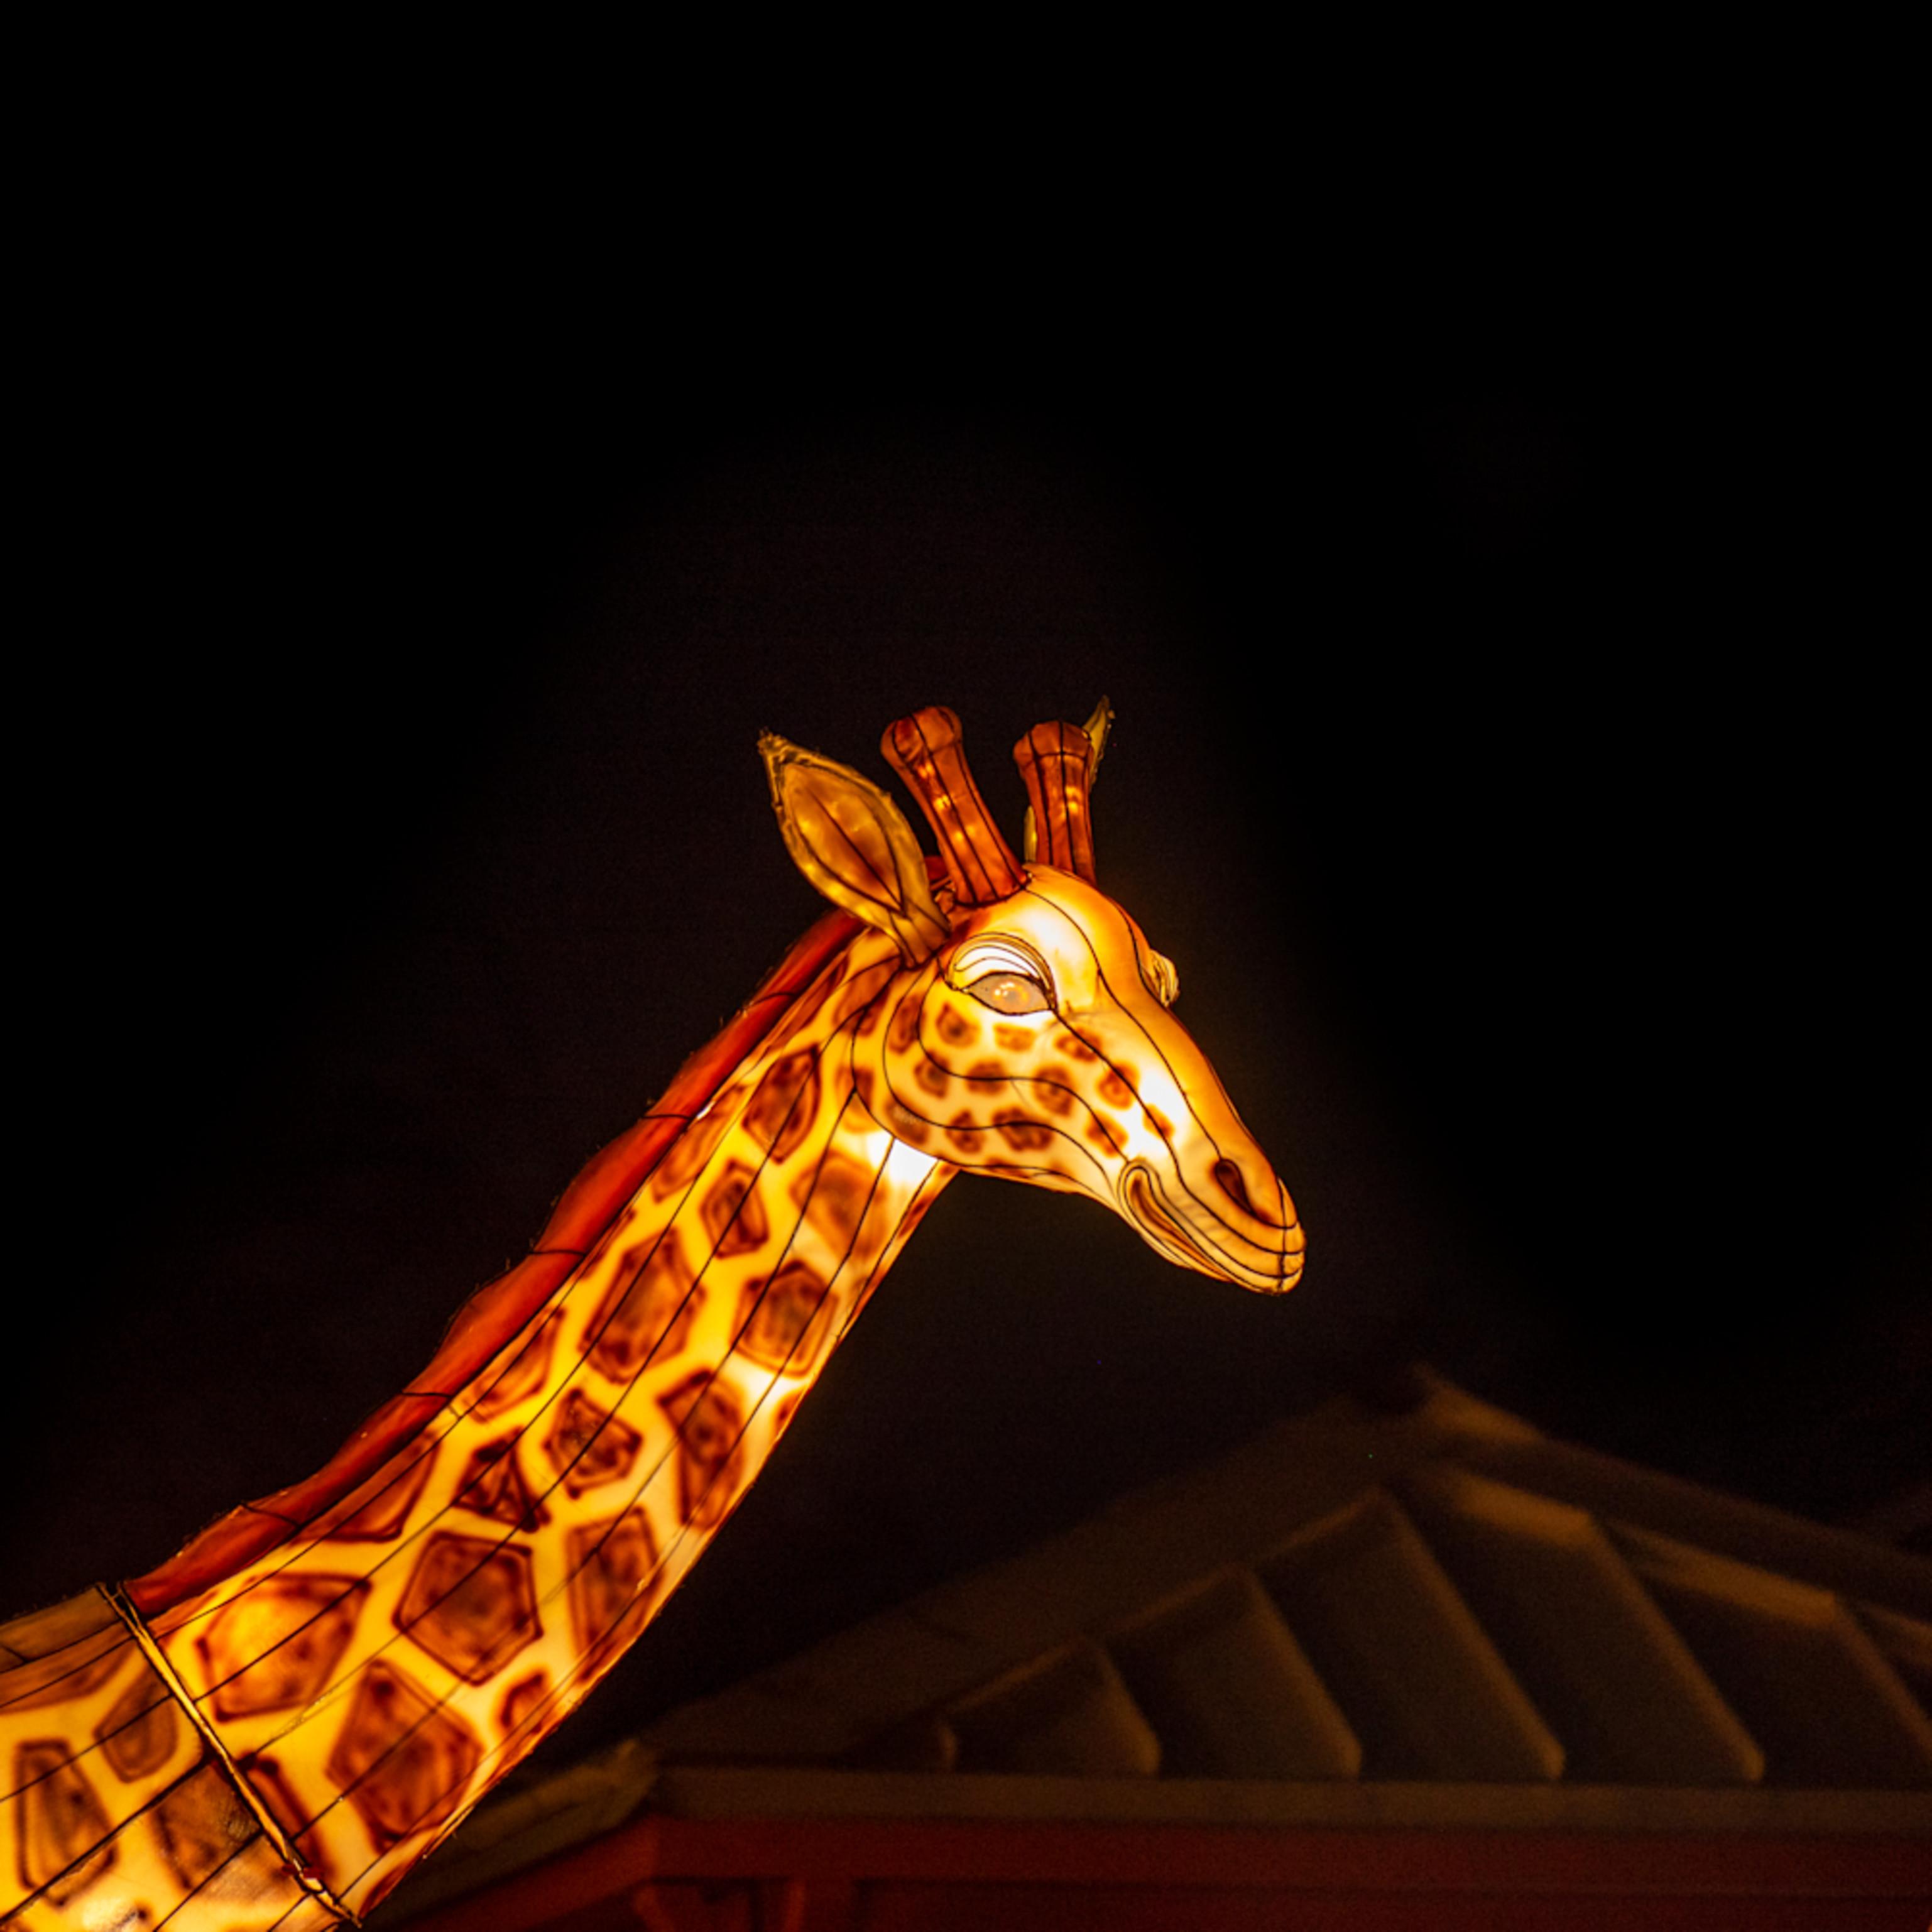 Giraffee tz4lpl